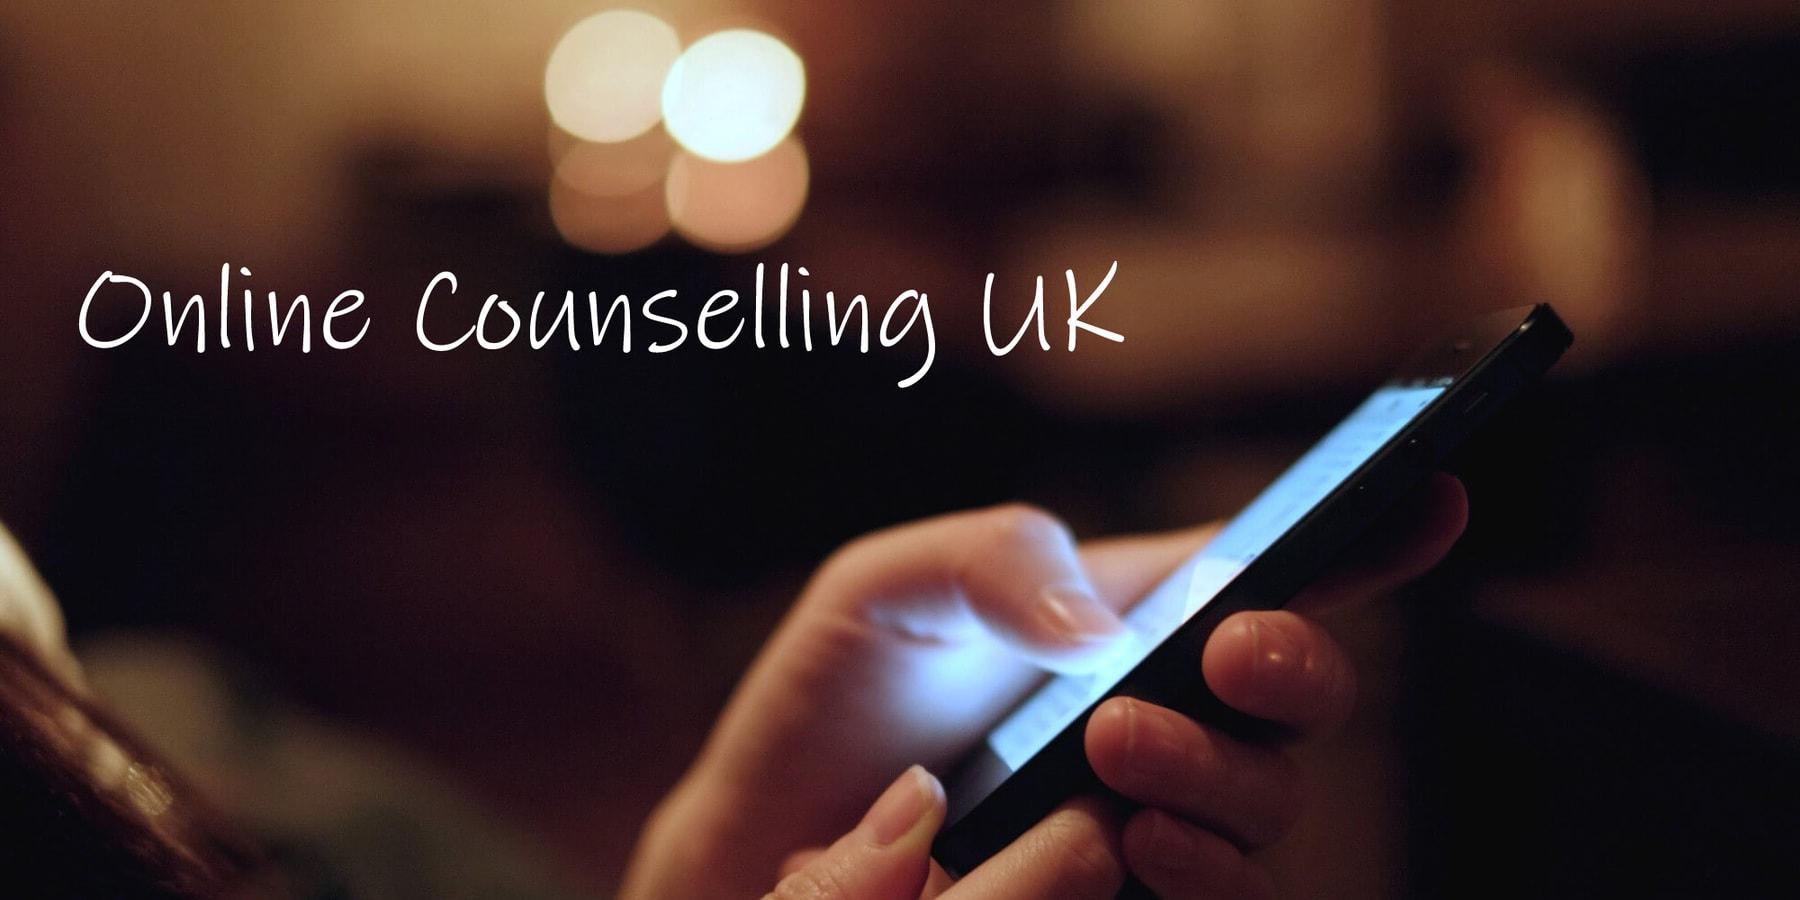 Online Counselling UK header image